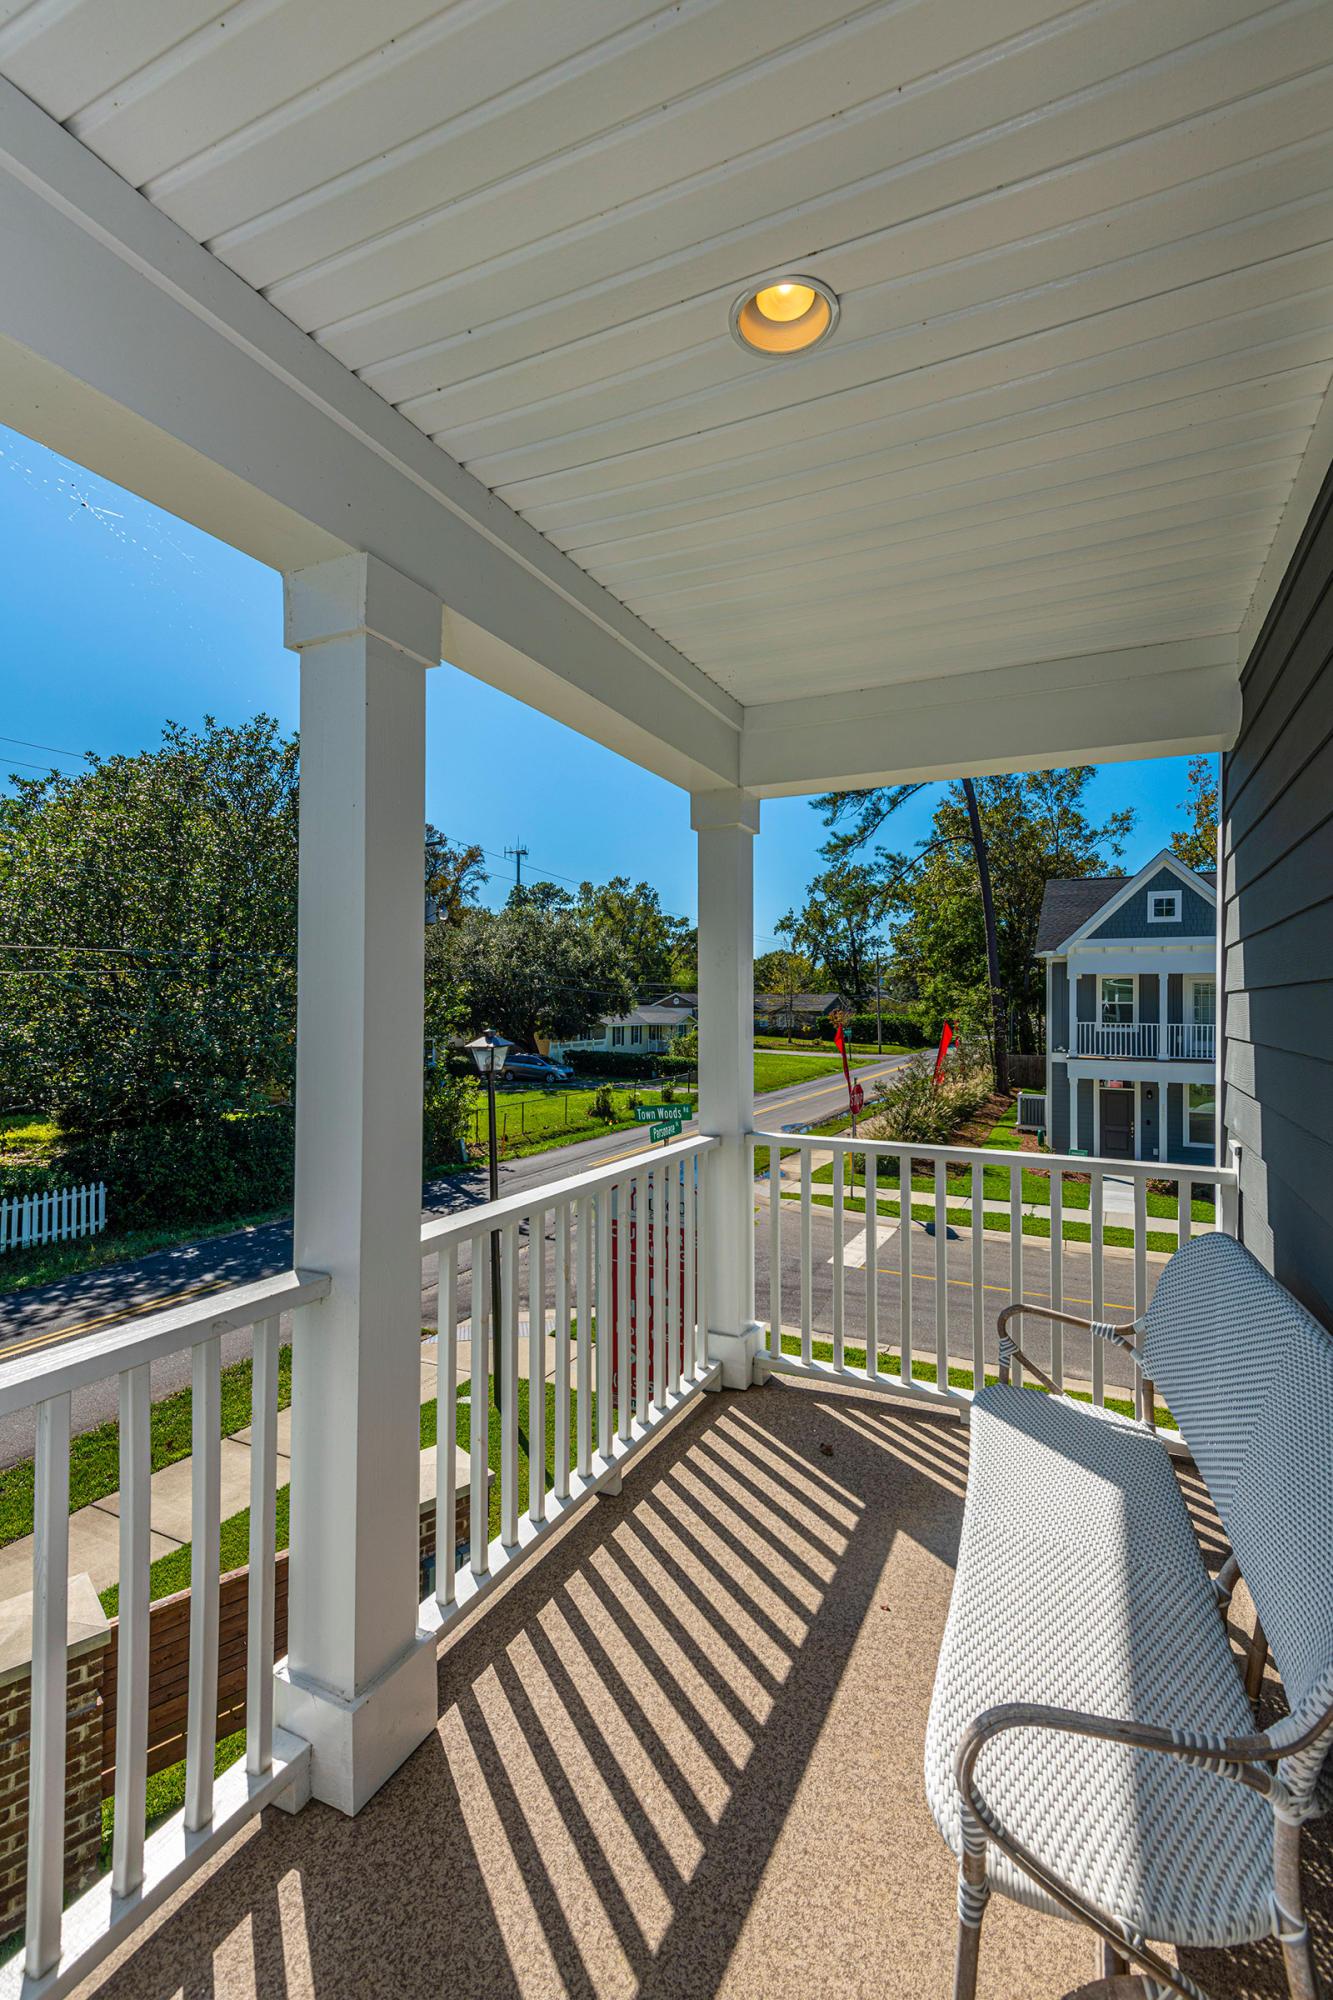 Church Creek Landing Homes For Sale - 2302 Town Woods, Charleston, SC - 31